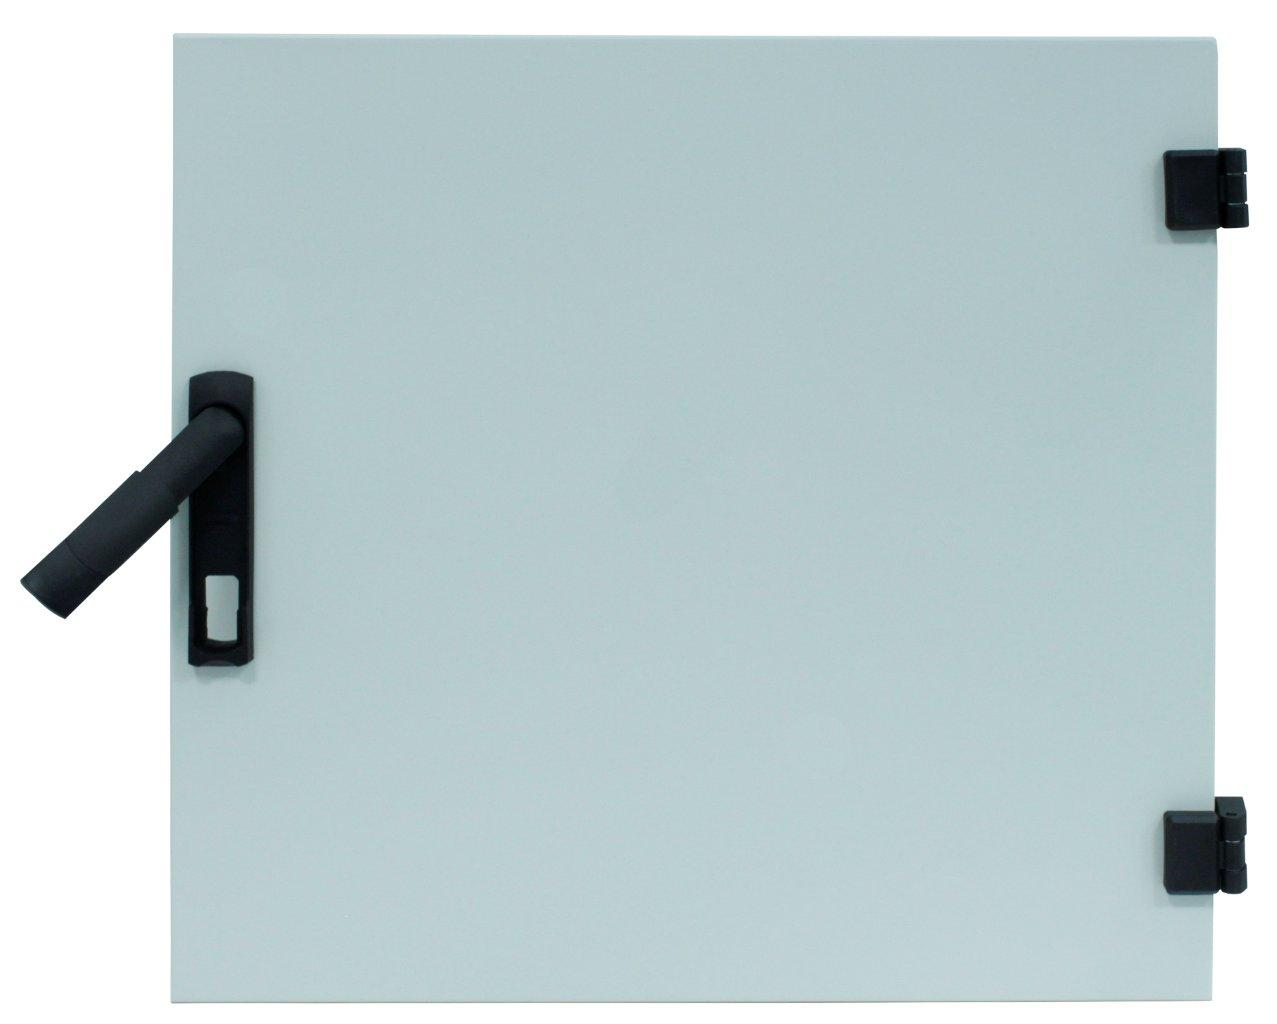 1 Stk Vollmetall-Tür f.DW-Schrank12HE,B600,RAL7035,HZ-Vorbereitung DWRT1266--